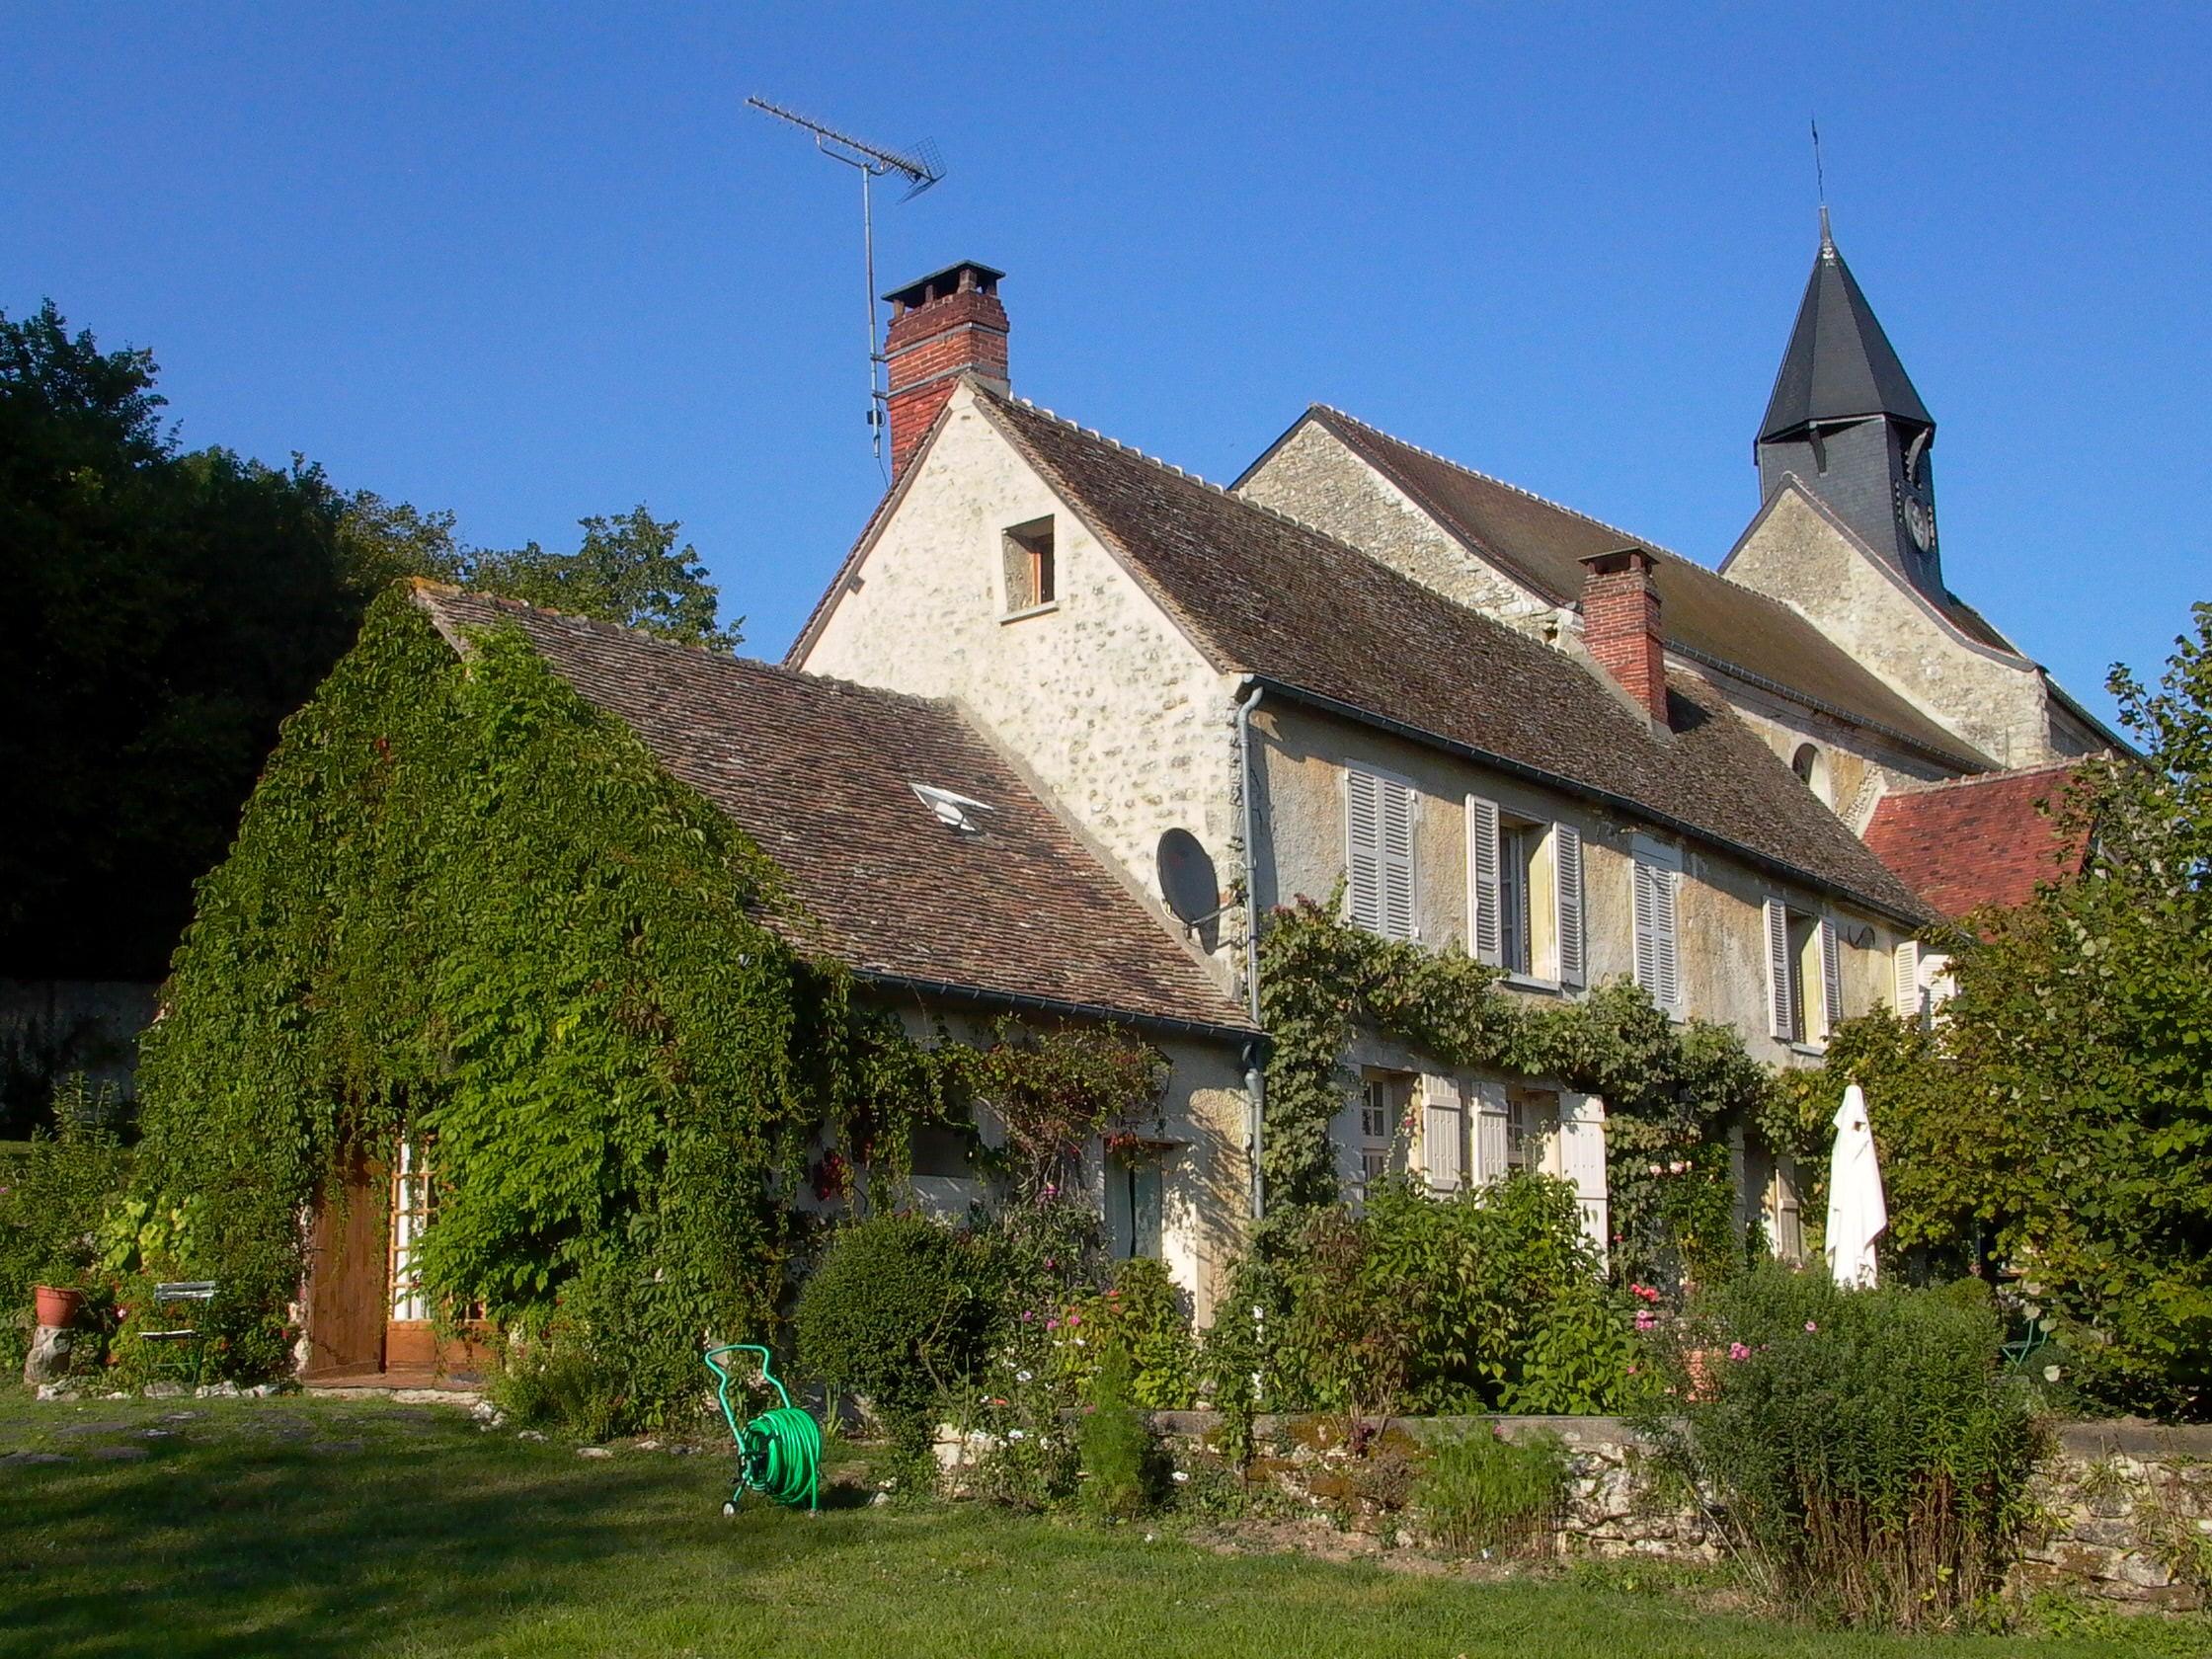 Presbytere de Montreuil sur Epte en 2005